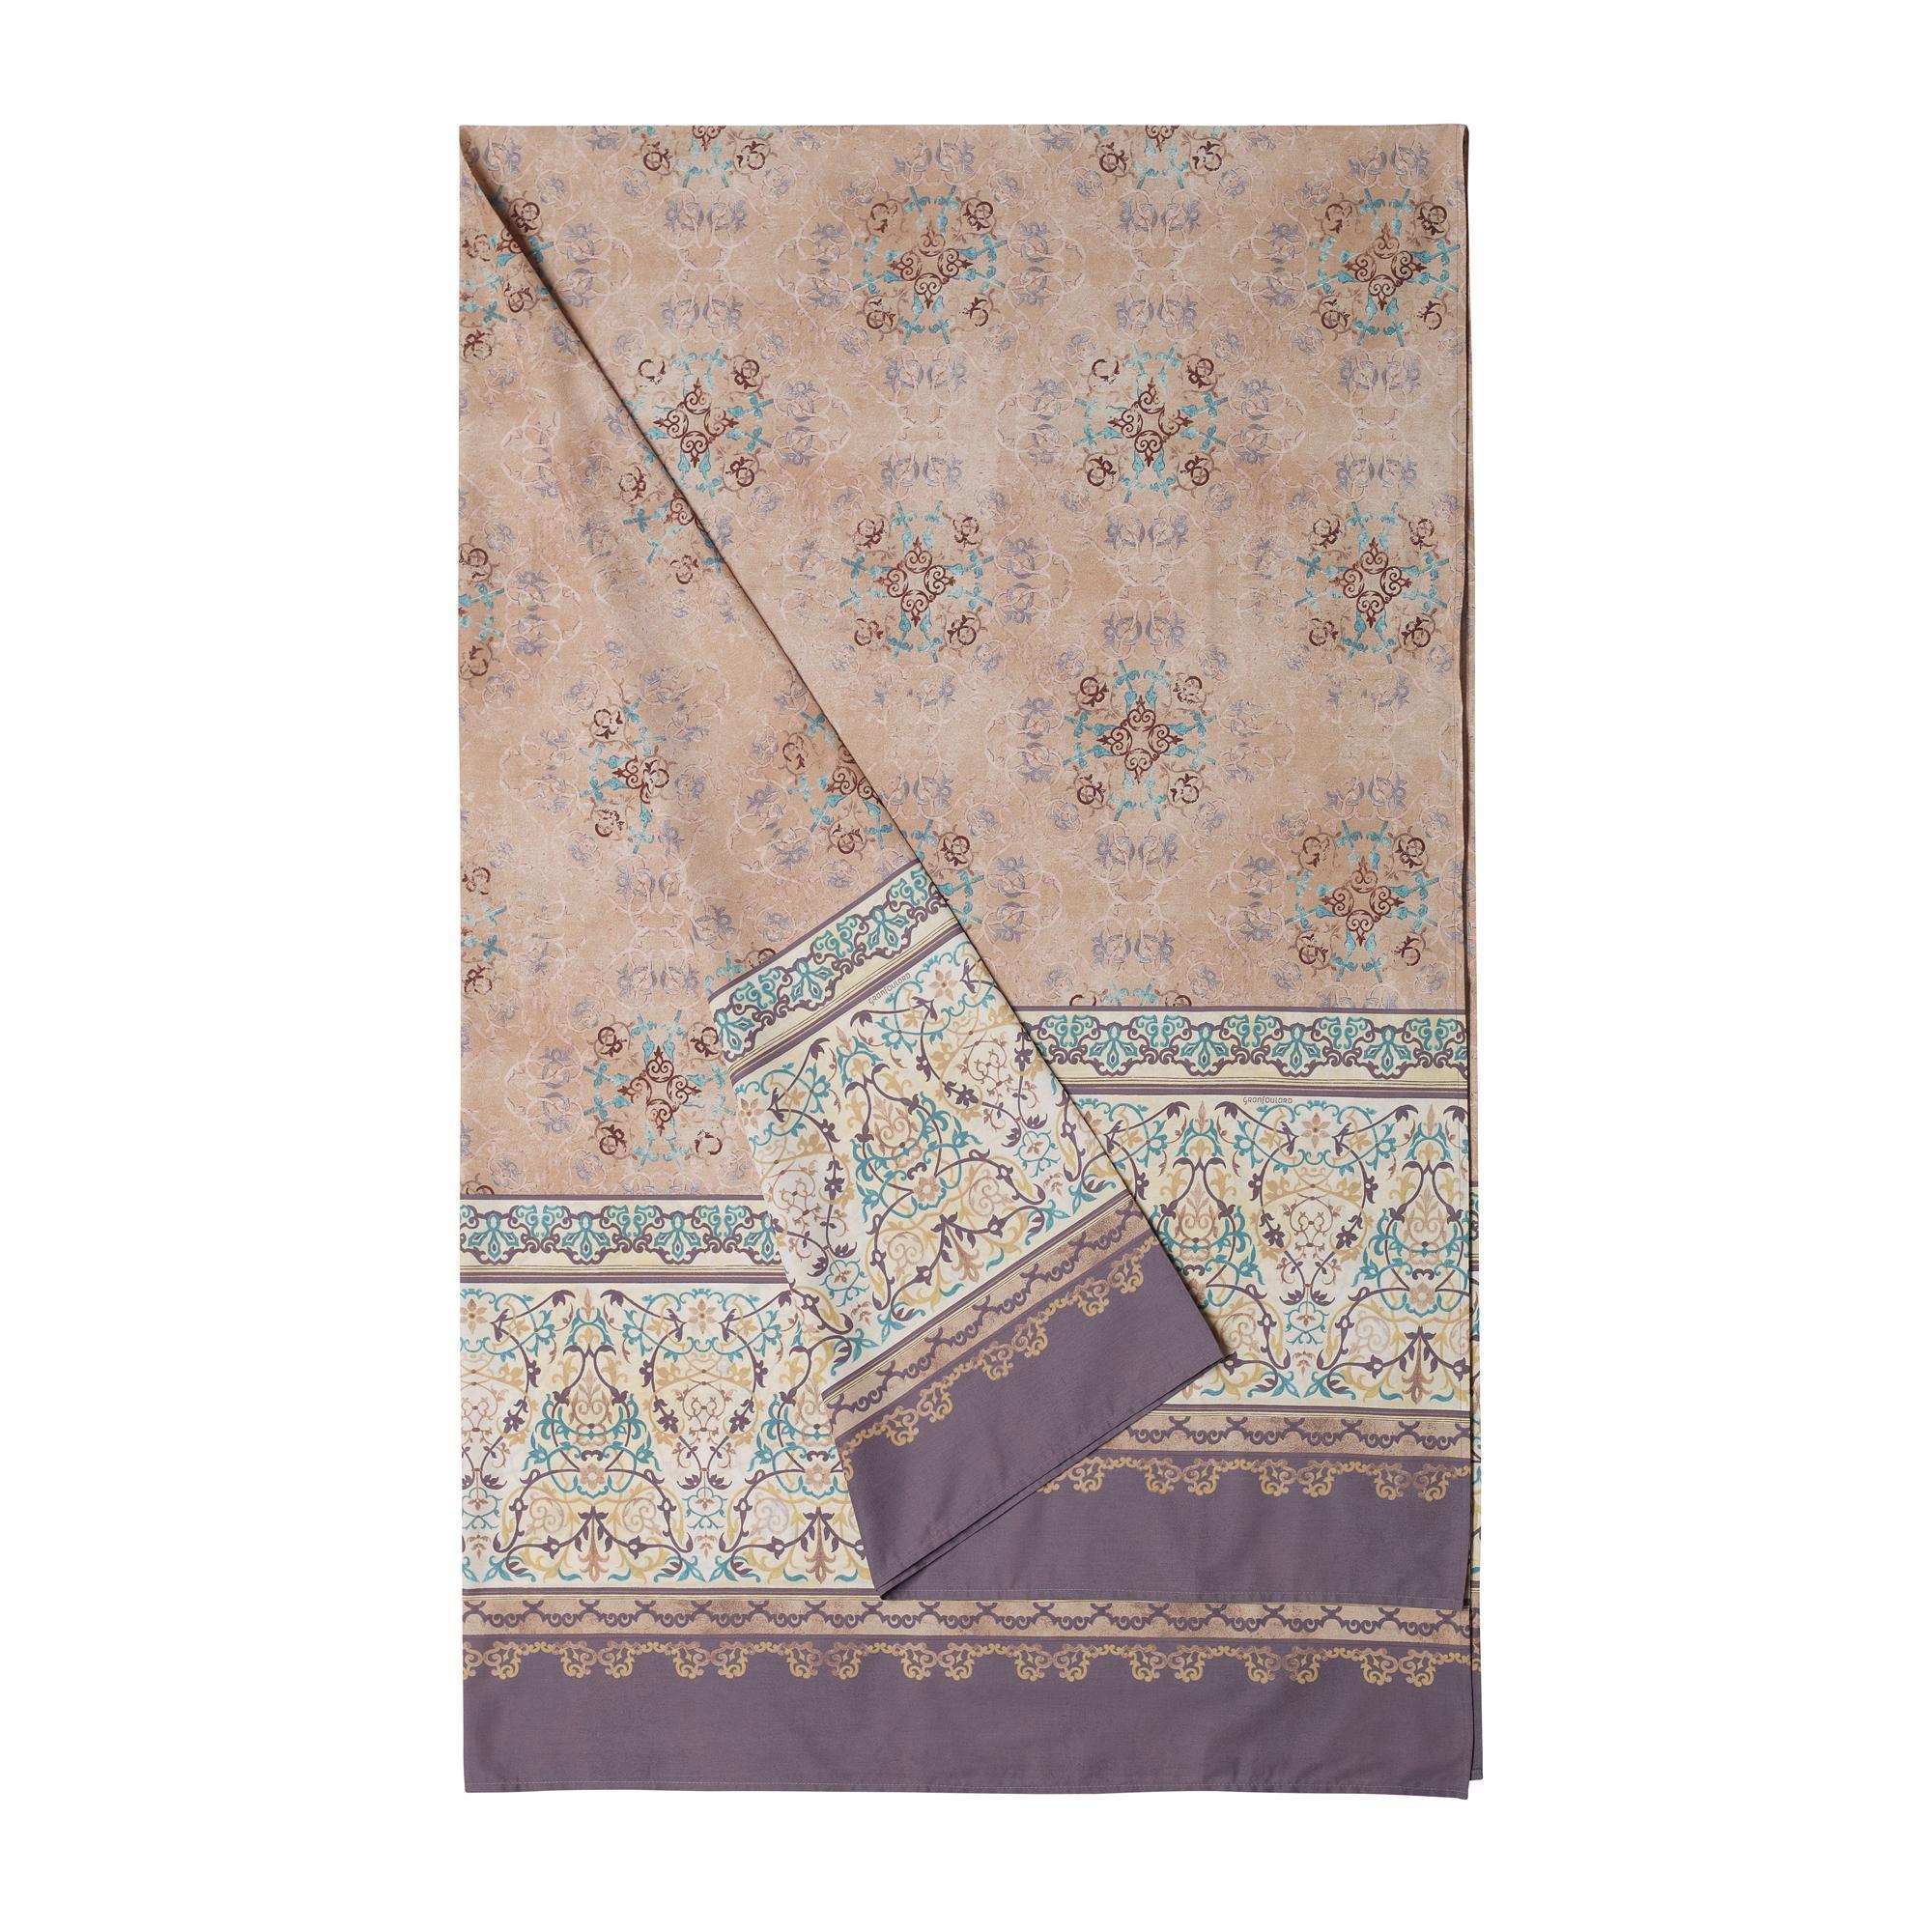 Bassetti granfoulard luini furniture blank v 6 beige pure for Bassetti telo arredo